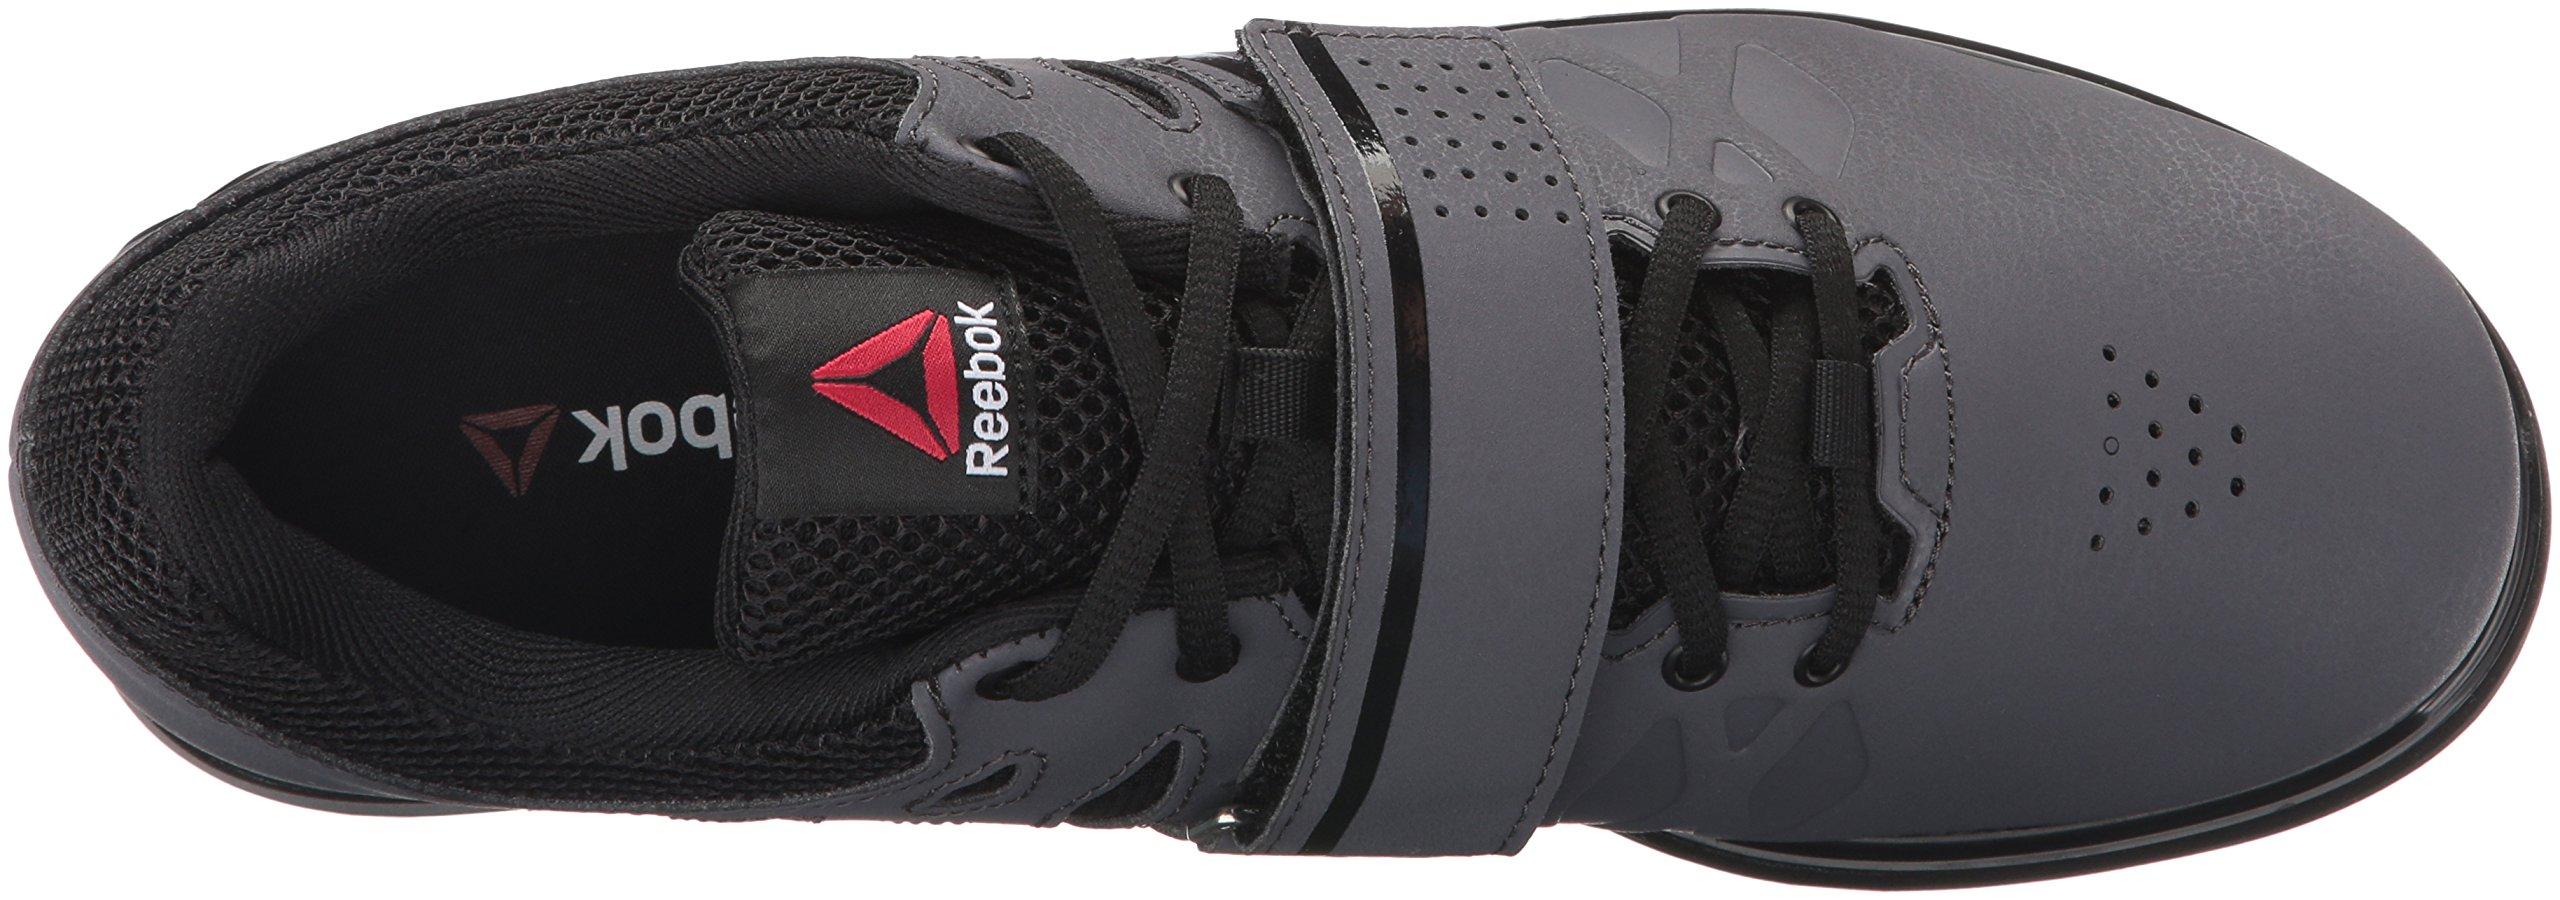 Reebok Men's Lifter Pr Cross-Trainer Shoe, Ash Grey/Black/White, 7 M US by Reebok (Image #13)